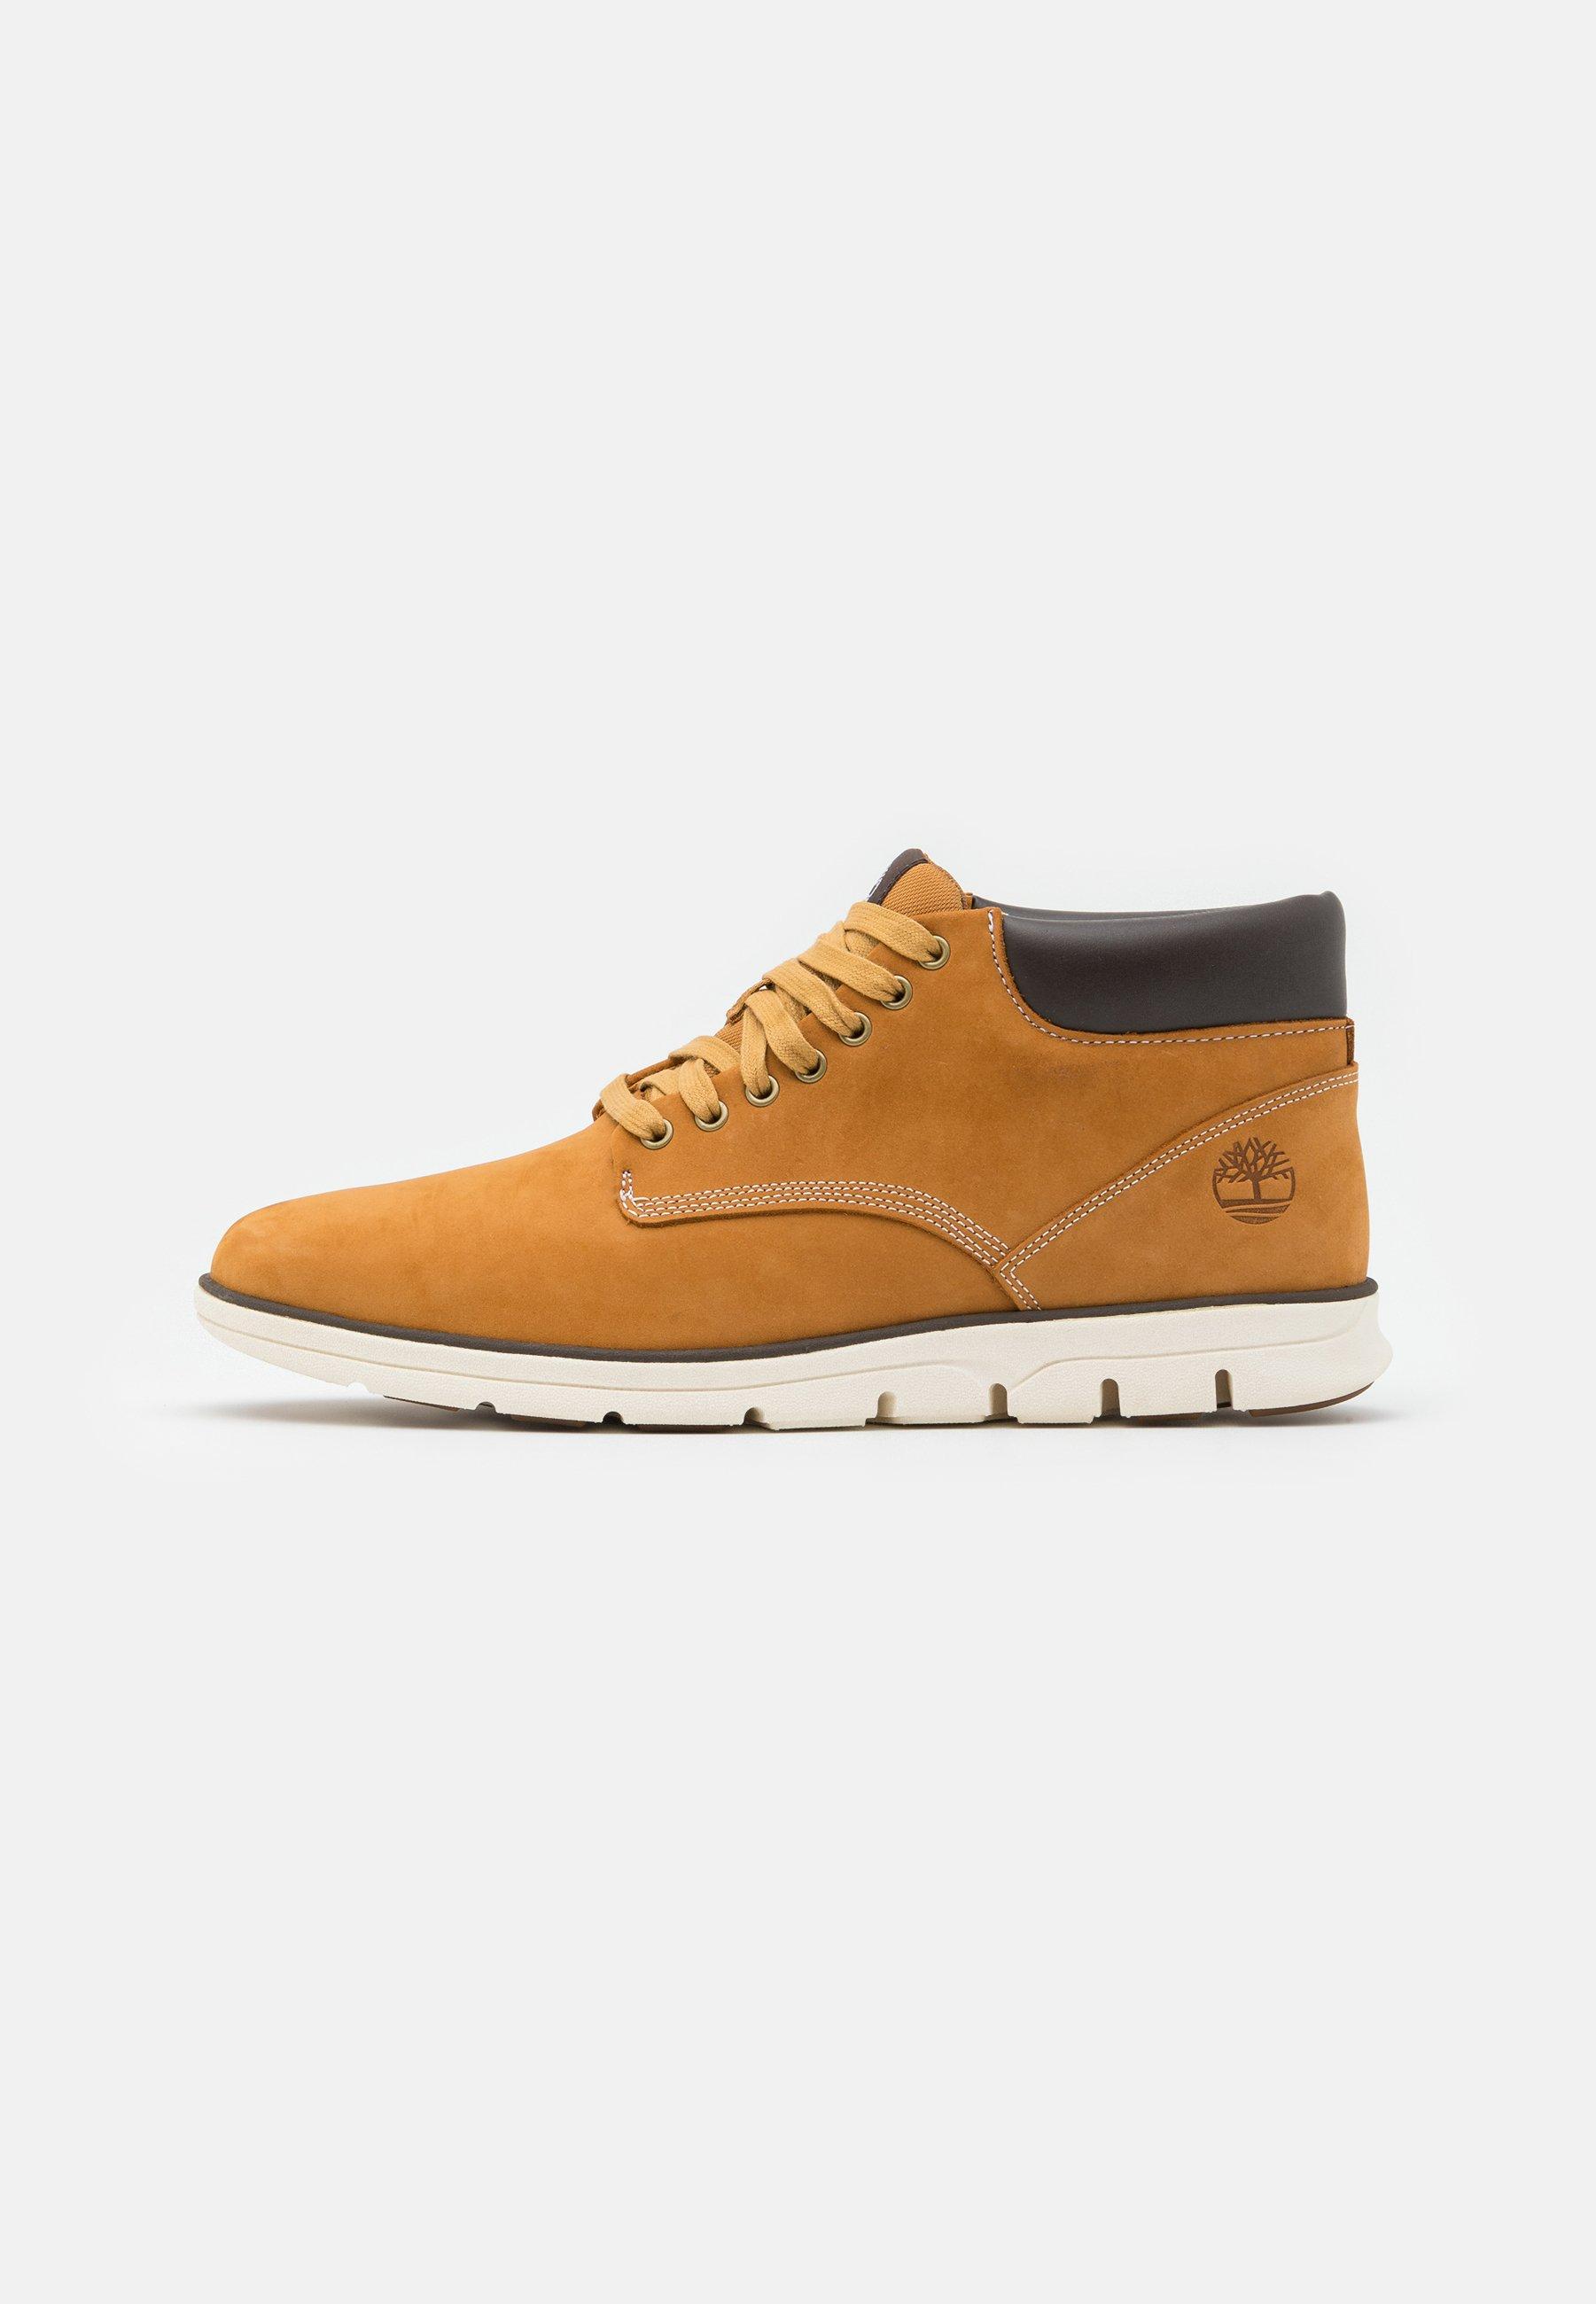 chaussure homme bottine cuir timberland